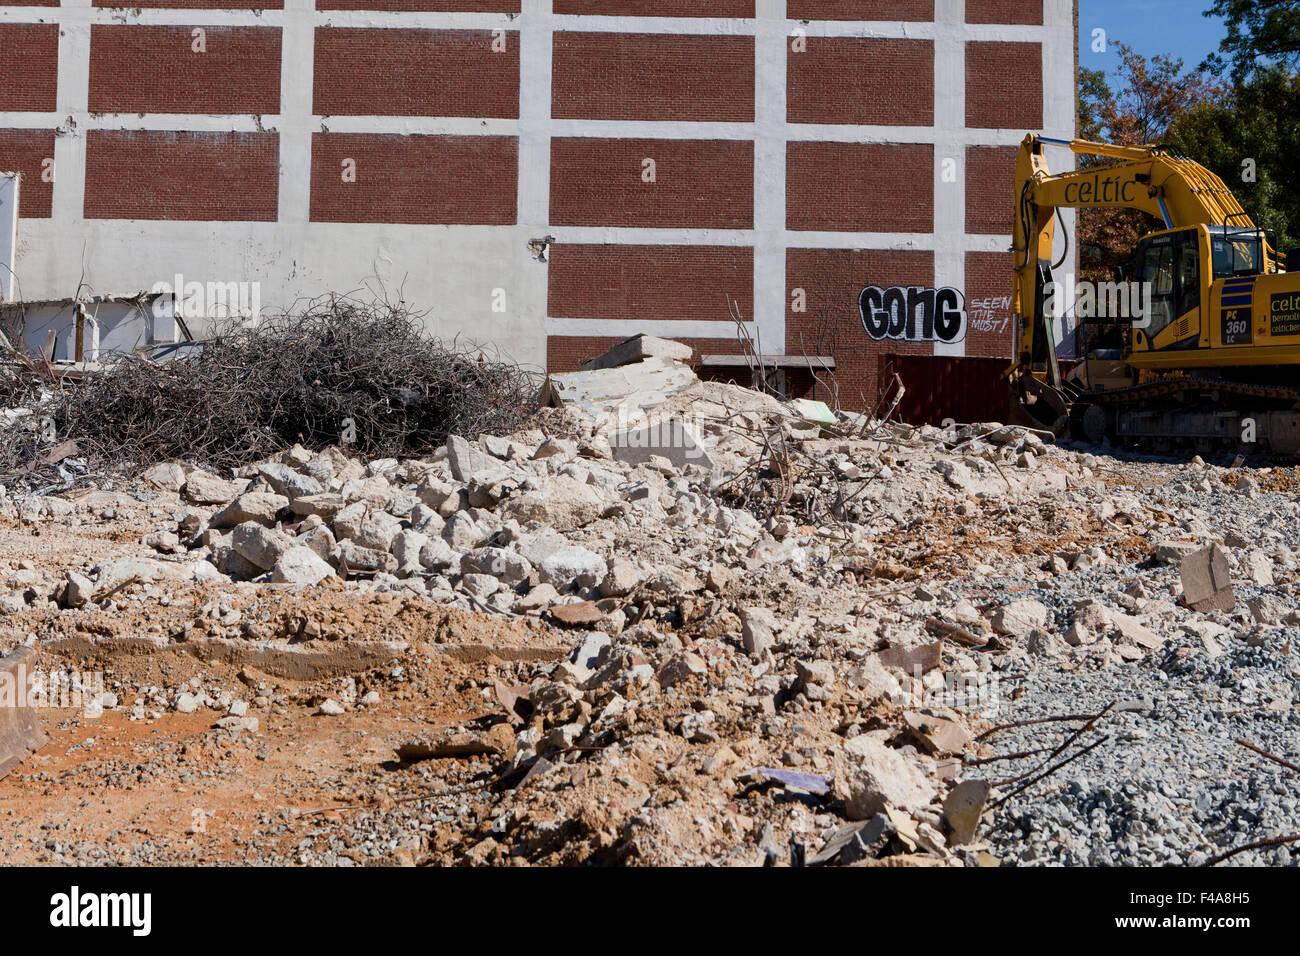 Building demolition site - USA - Stock Image